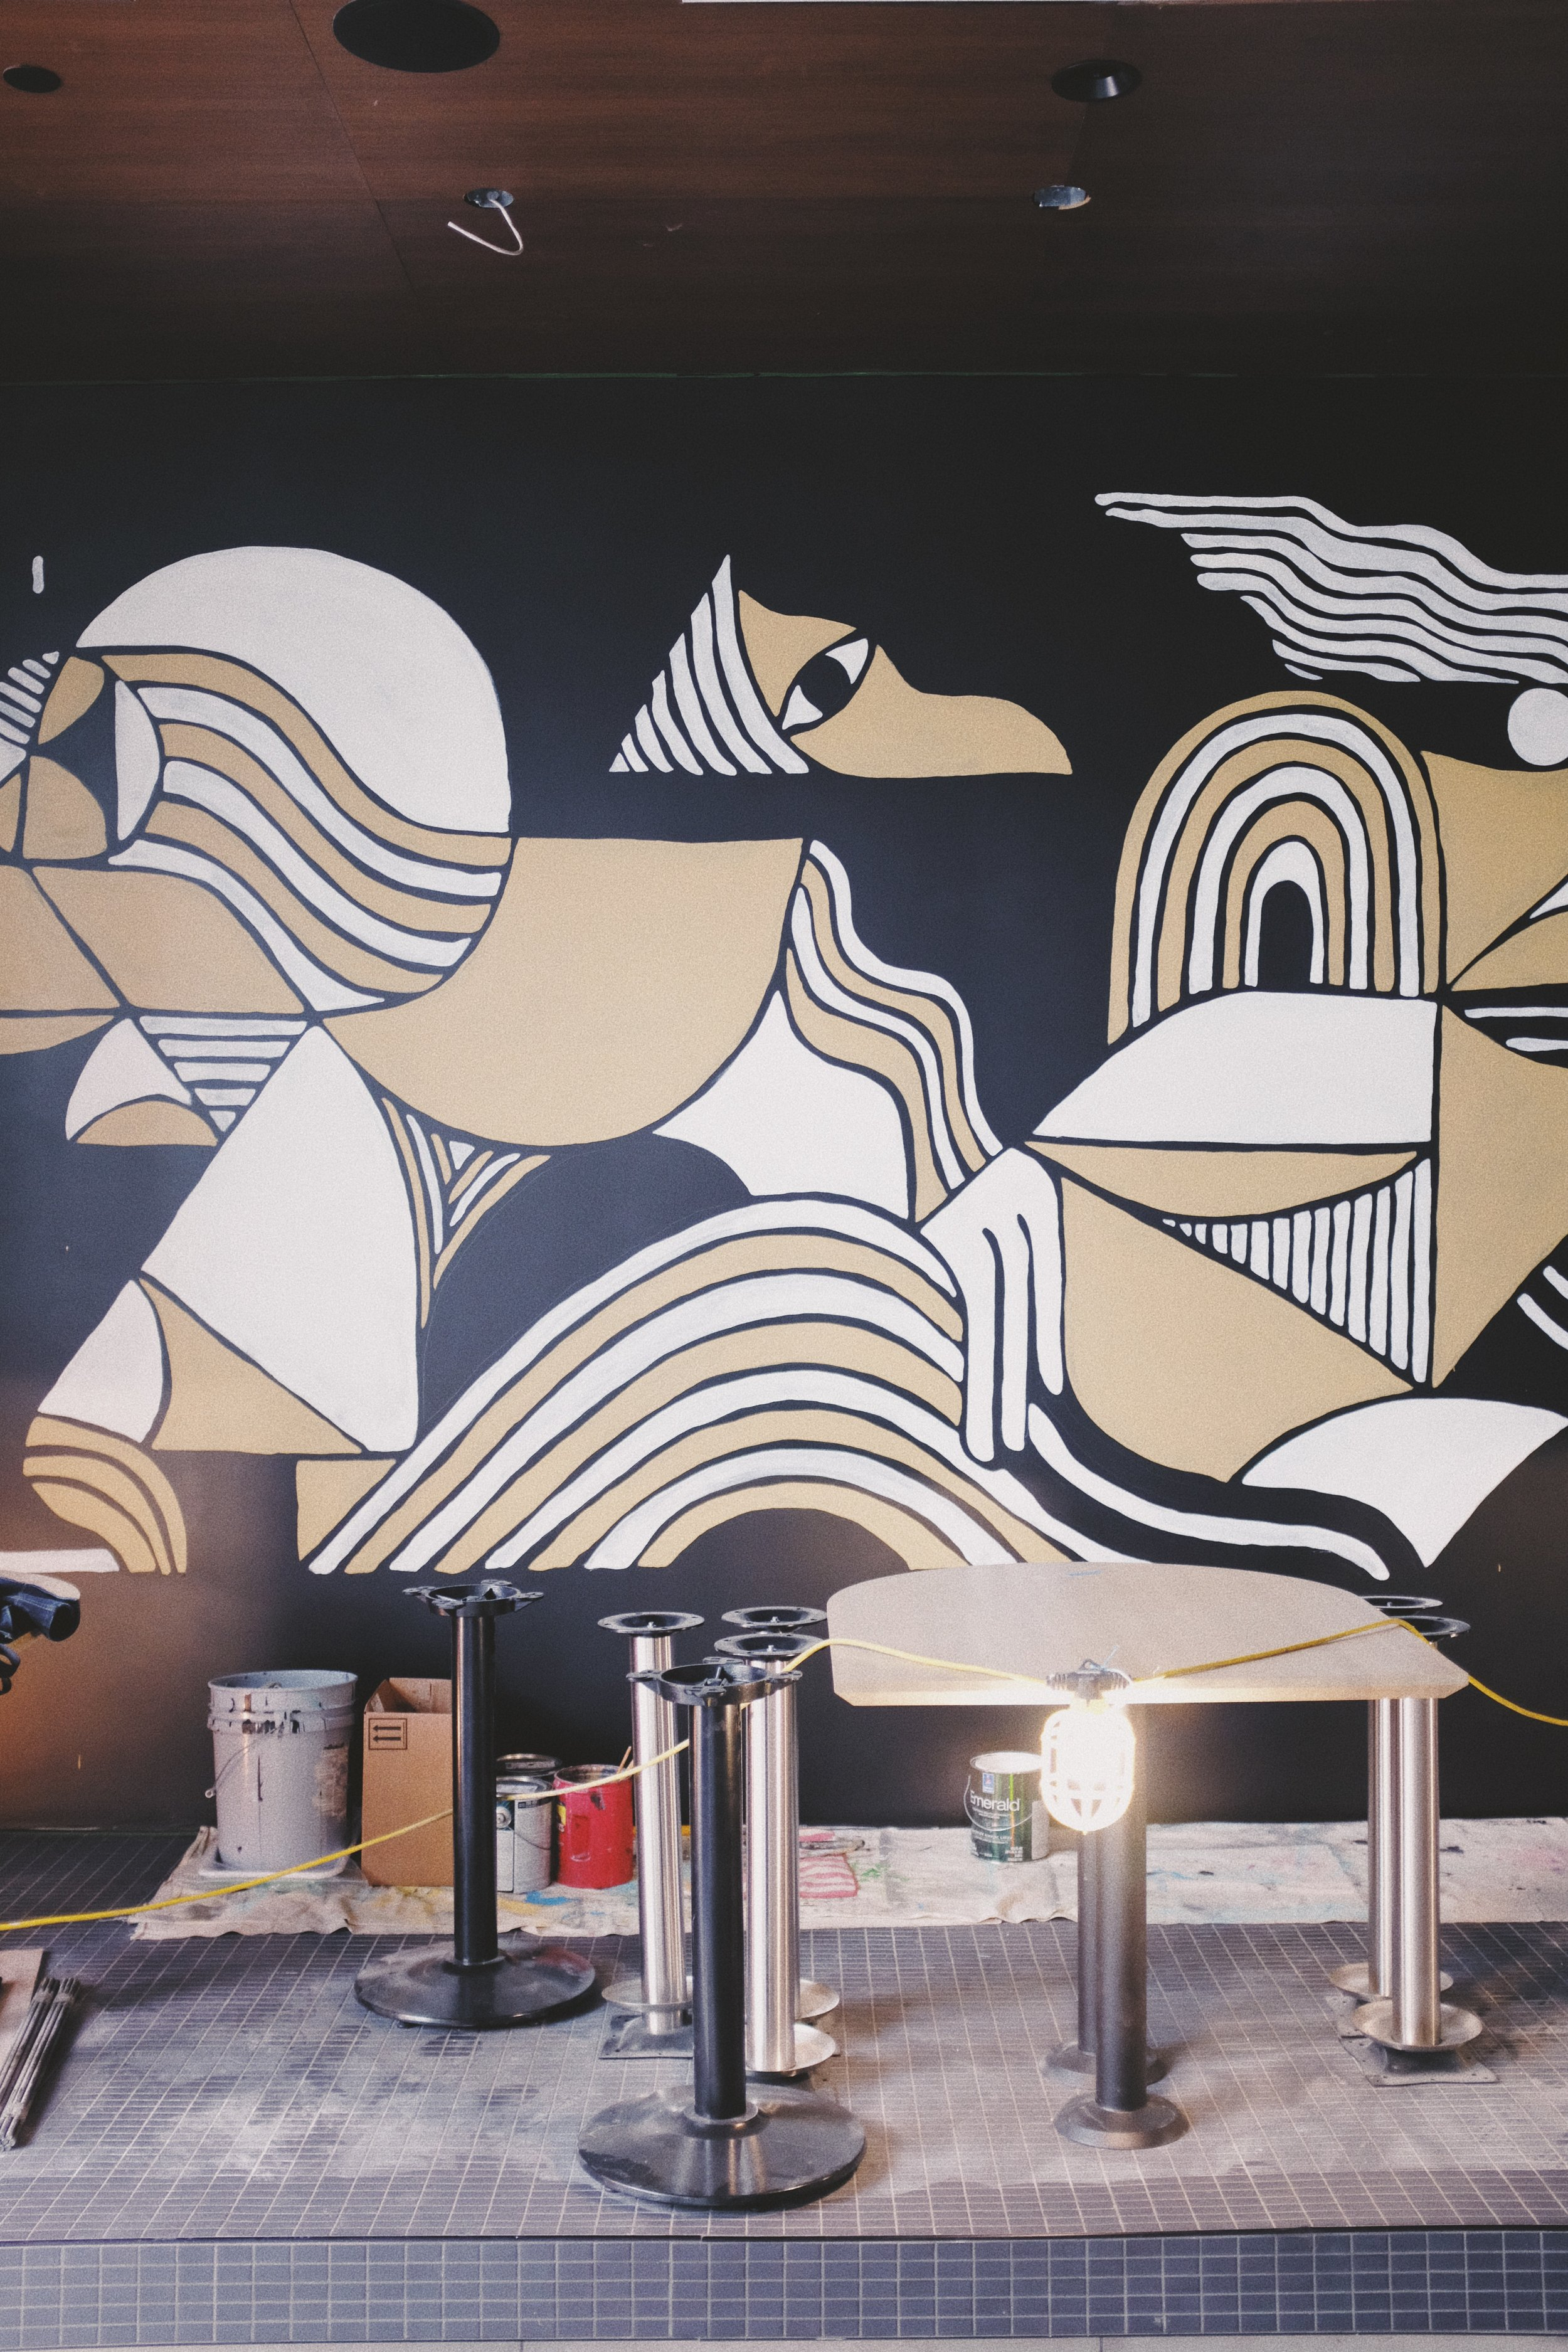 Earls Restaurant Mural Detail by Kyle Steed